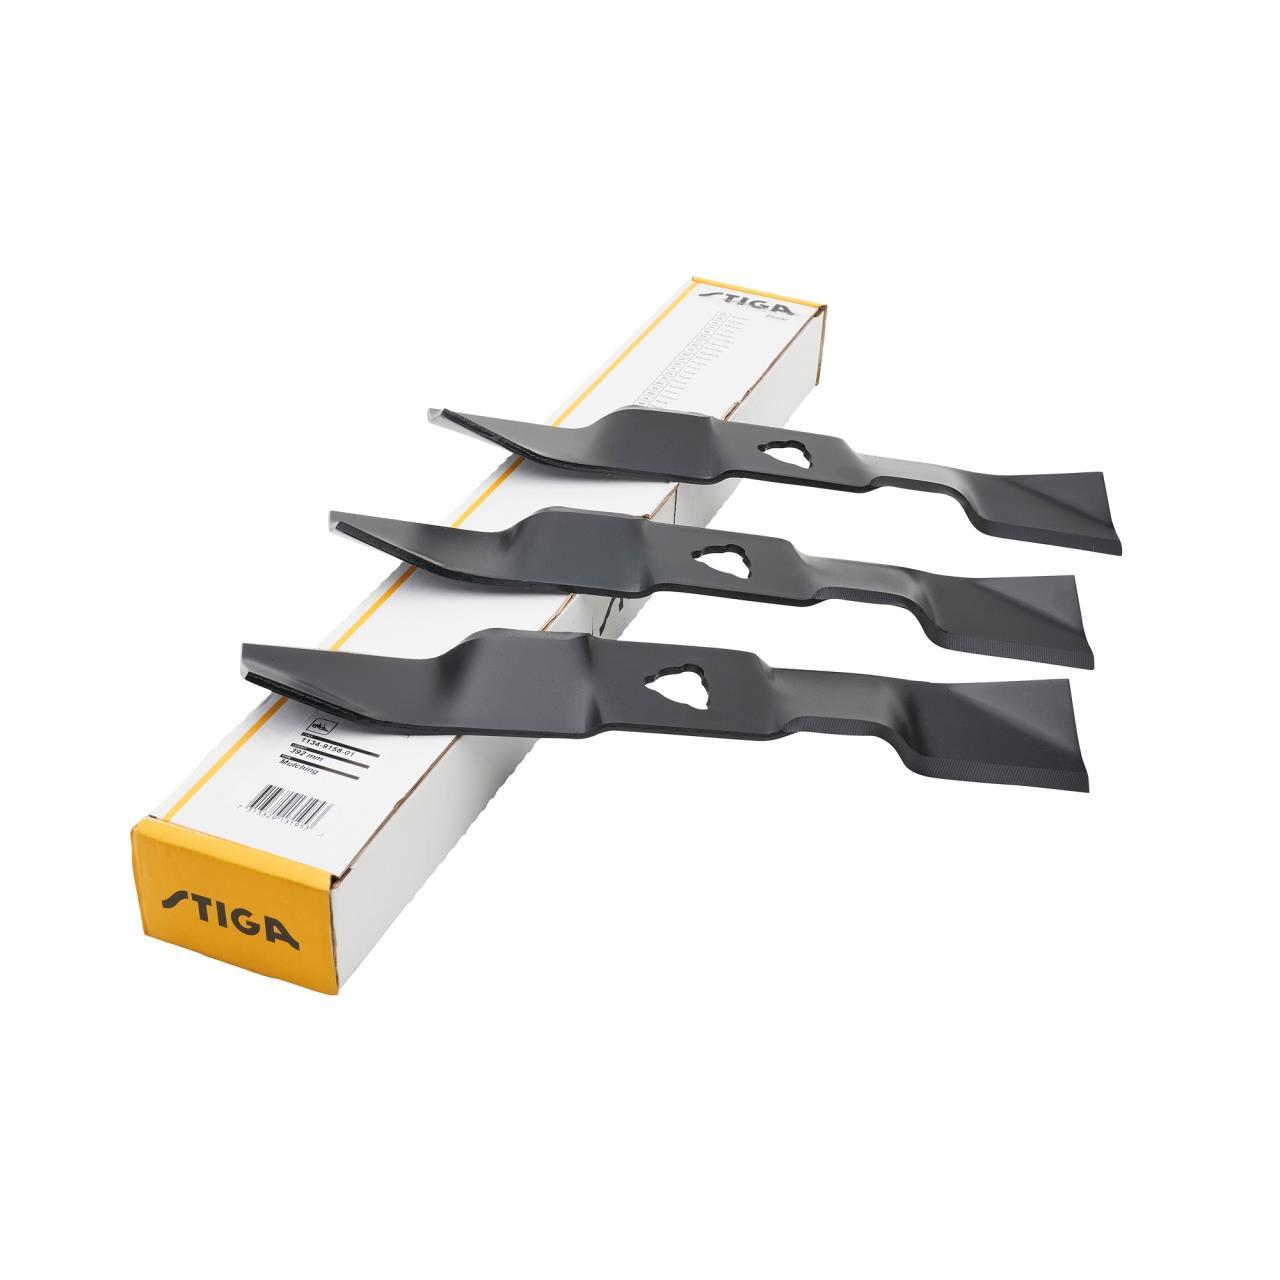 Stiga knivsæt 3 stk., 100 C